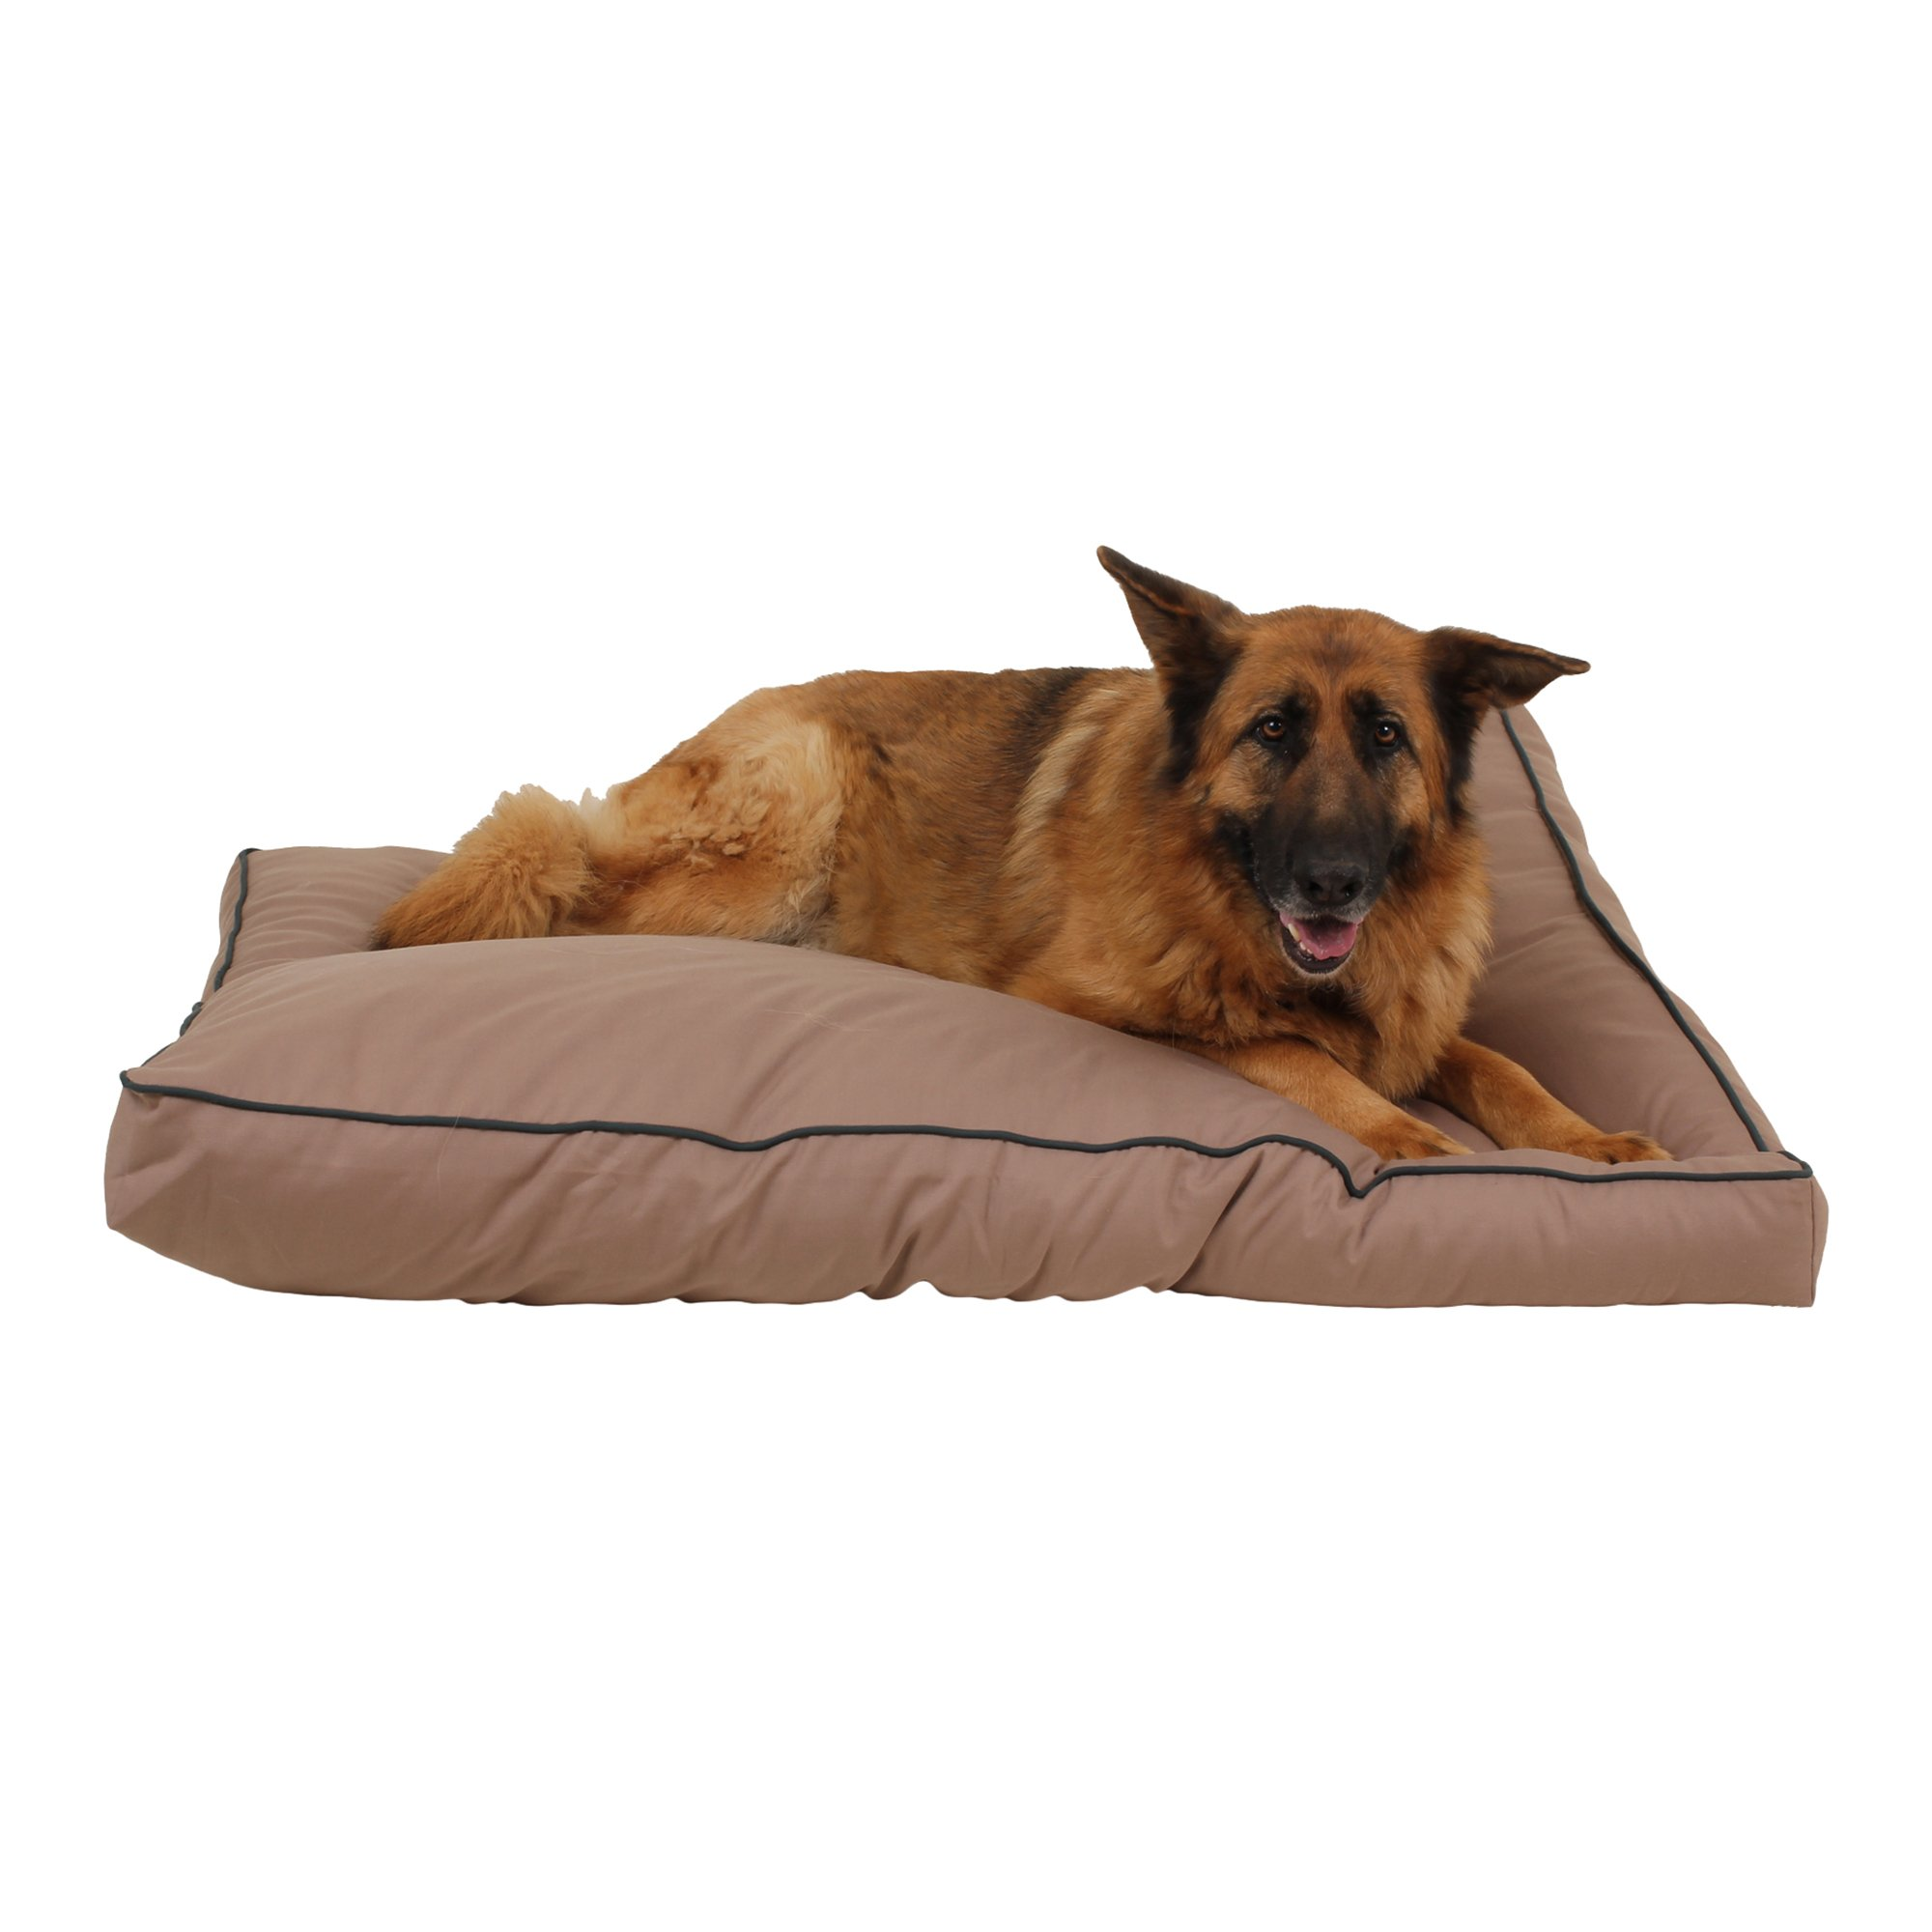 Carolina Pet Company Indoor Outdoor Jamison Tan Faux Gusset Dog Bed